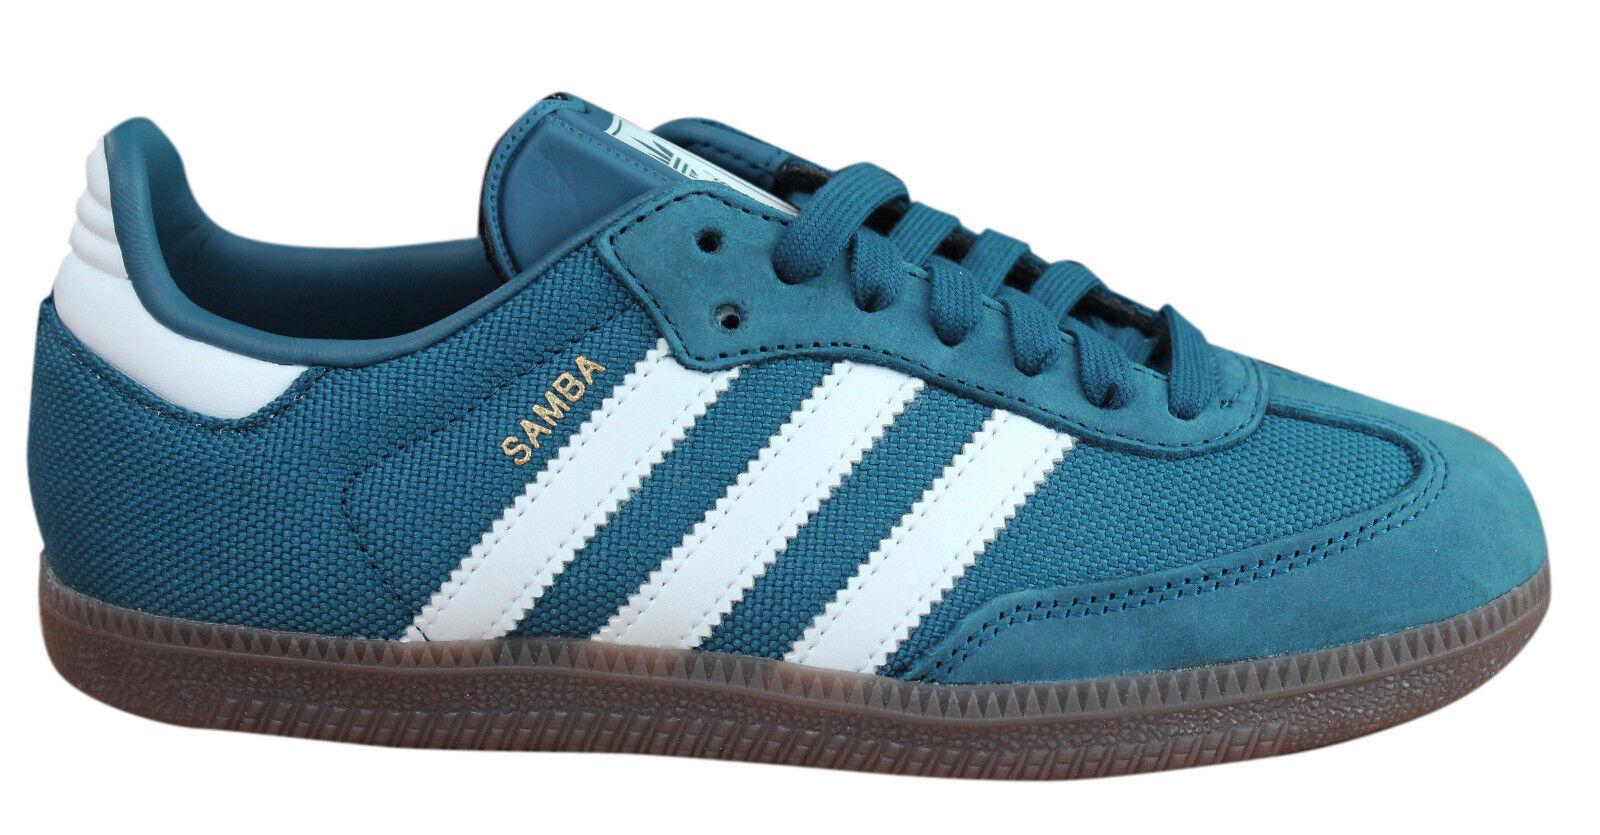 Adidas Originals Samba Mens Trainers Lace Up Shoes Blue Suede ... 65722691d671